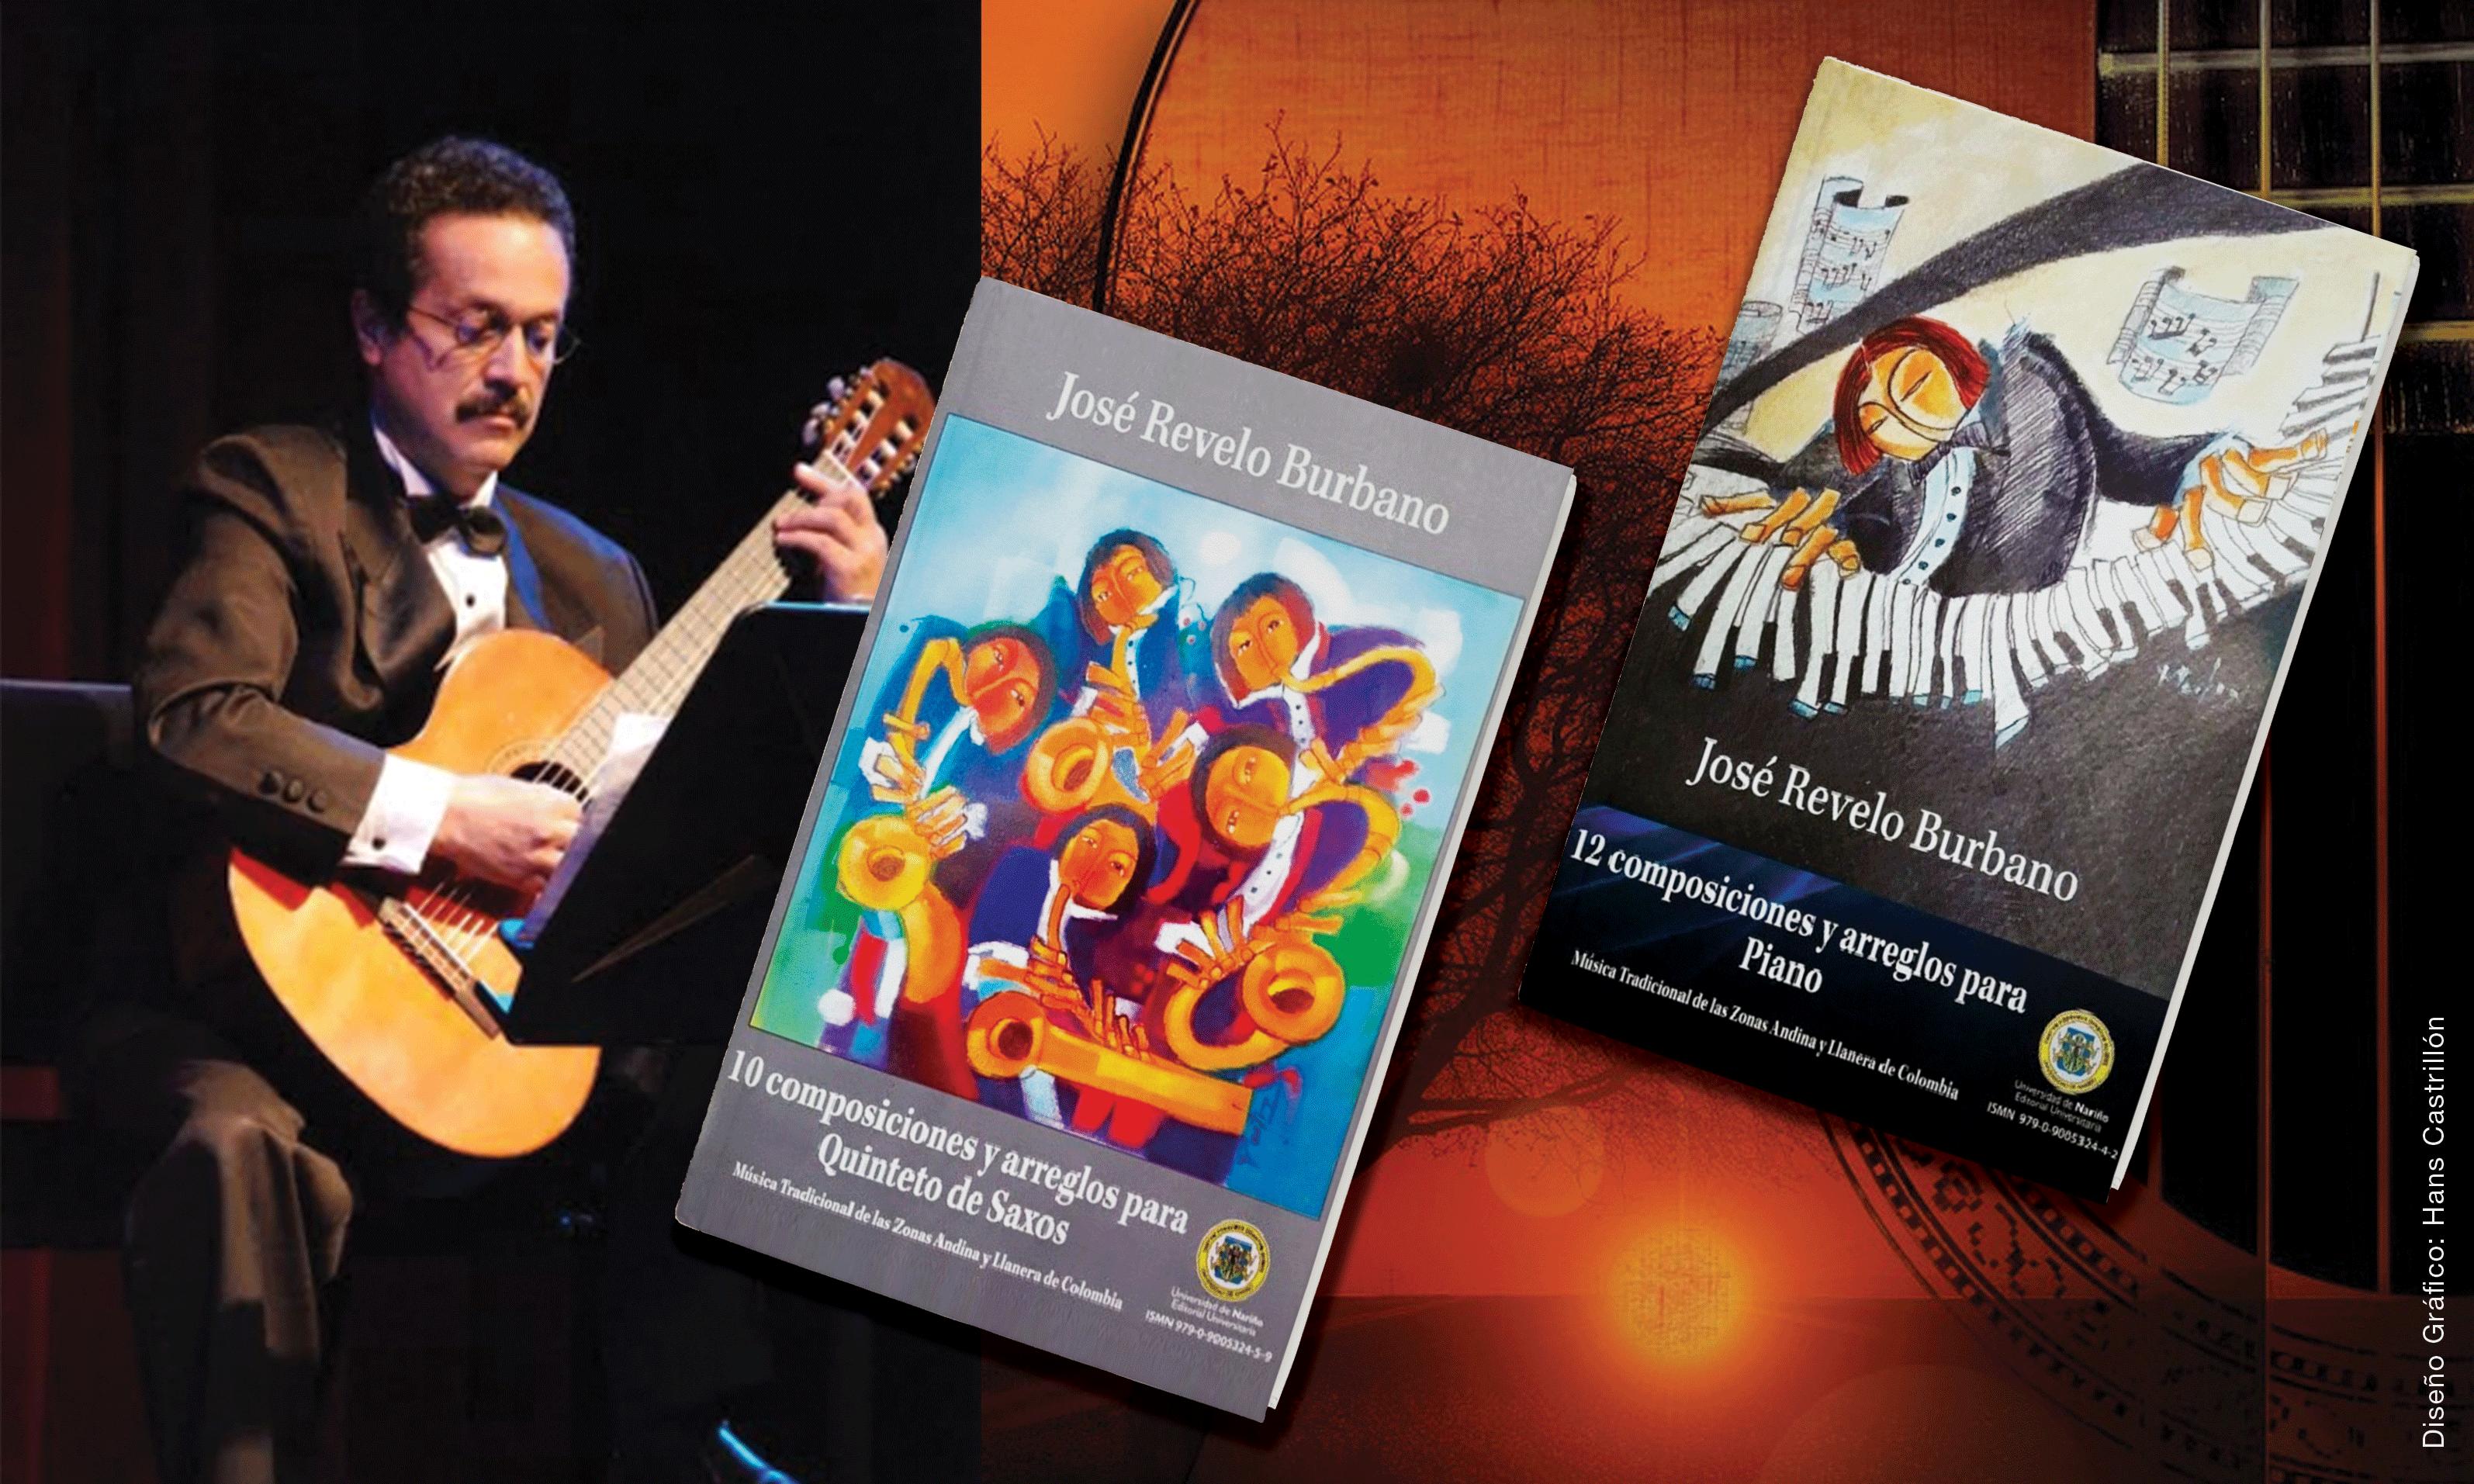 musica-tradicional-maestro-jose-revelo-burbano-udenar-periodico